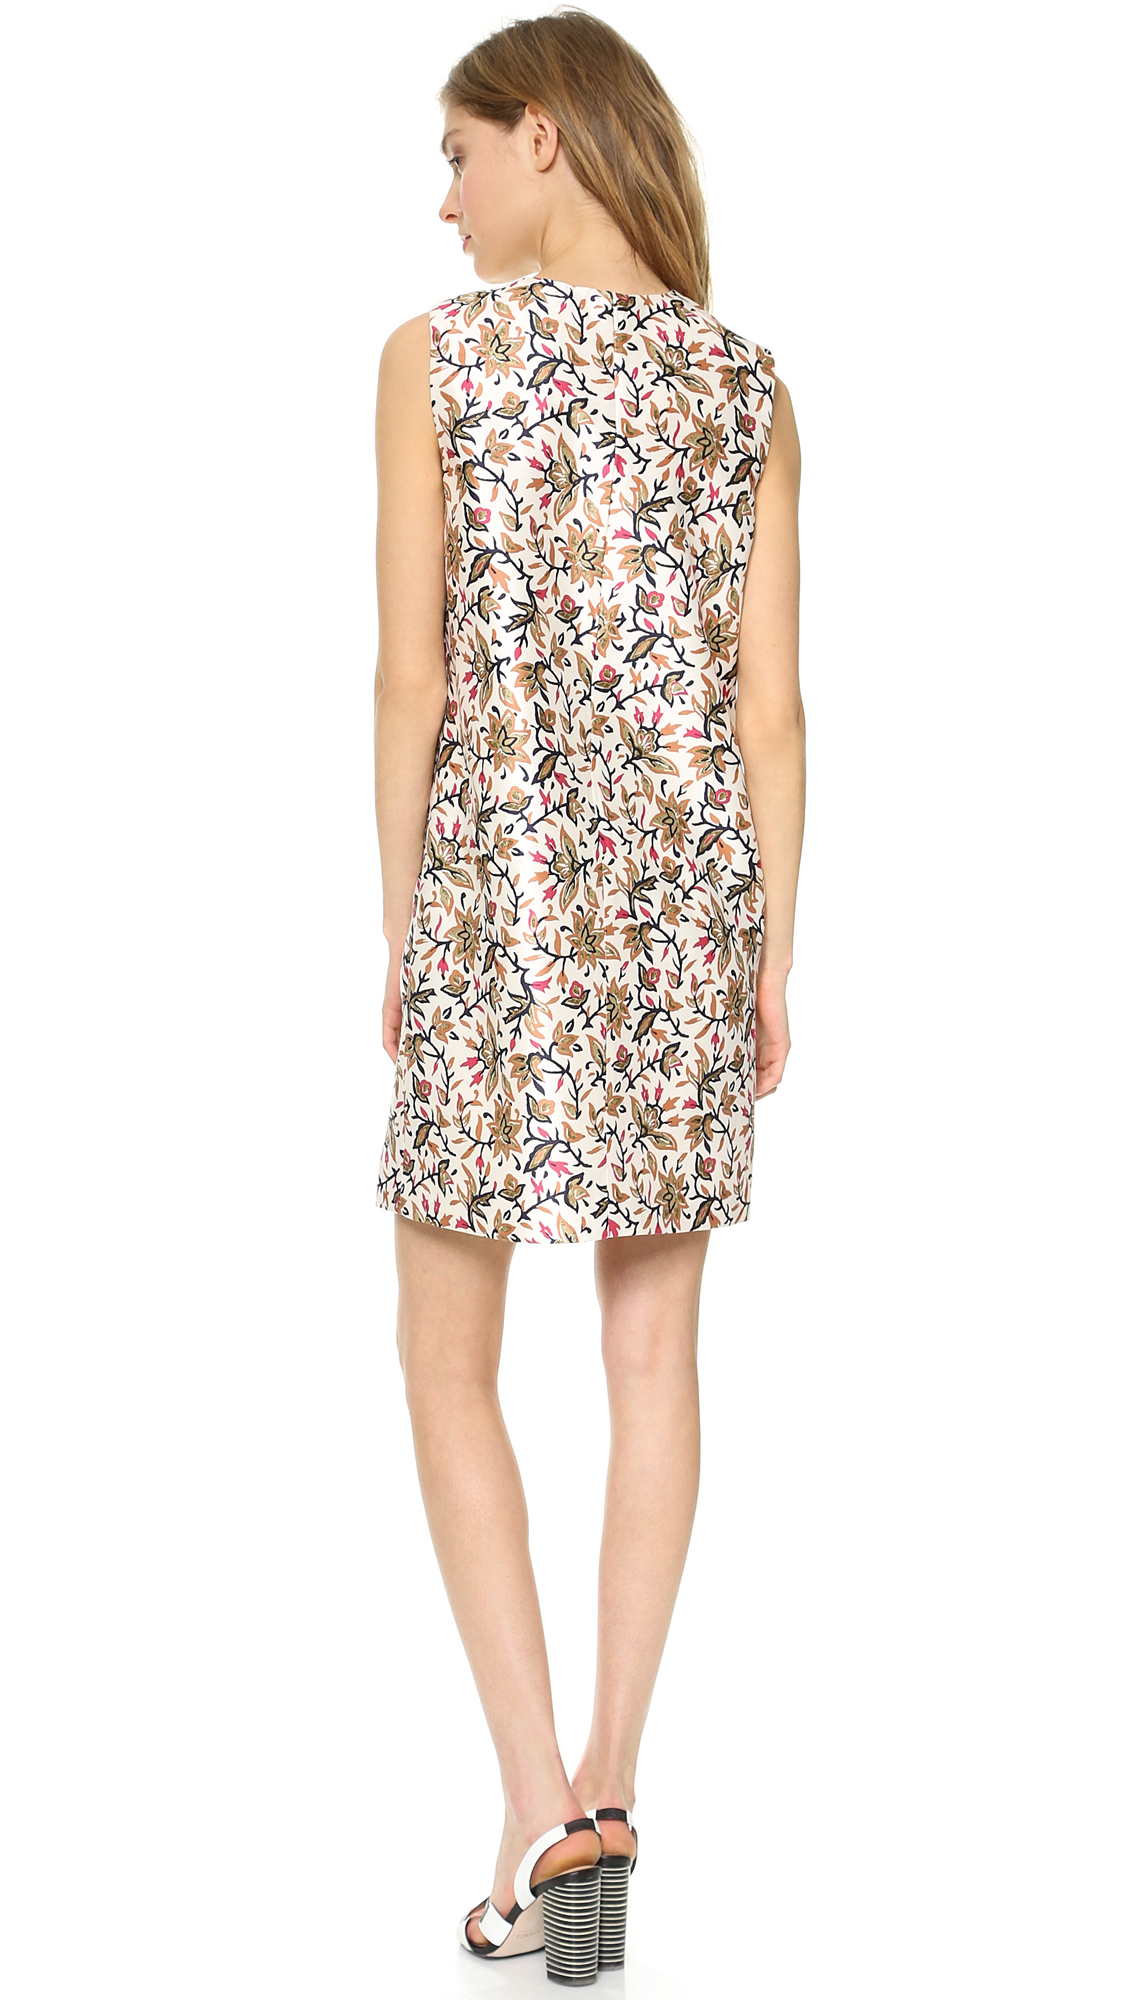 Tory Burch Embellished Strap Floral Dress Lyst